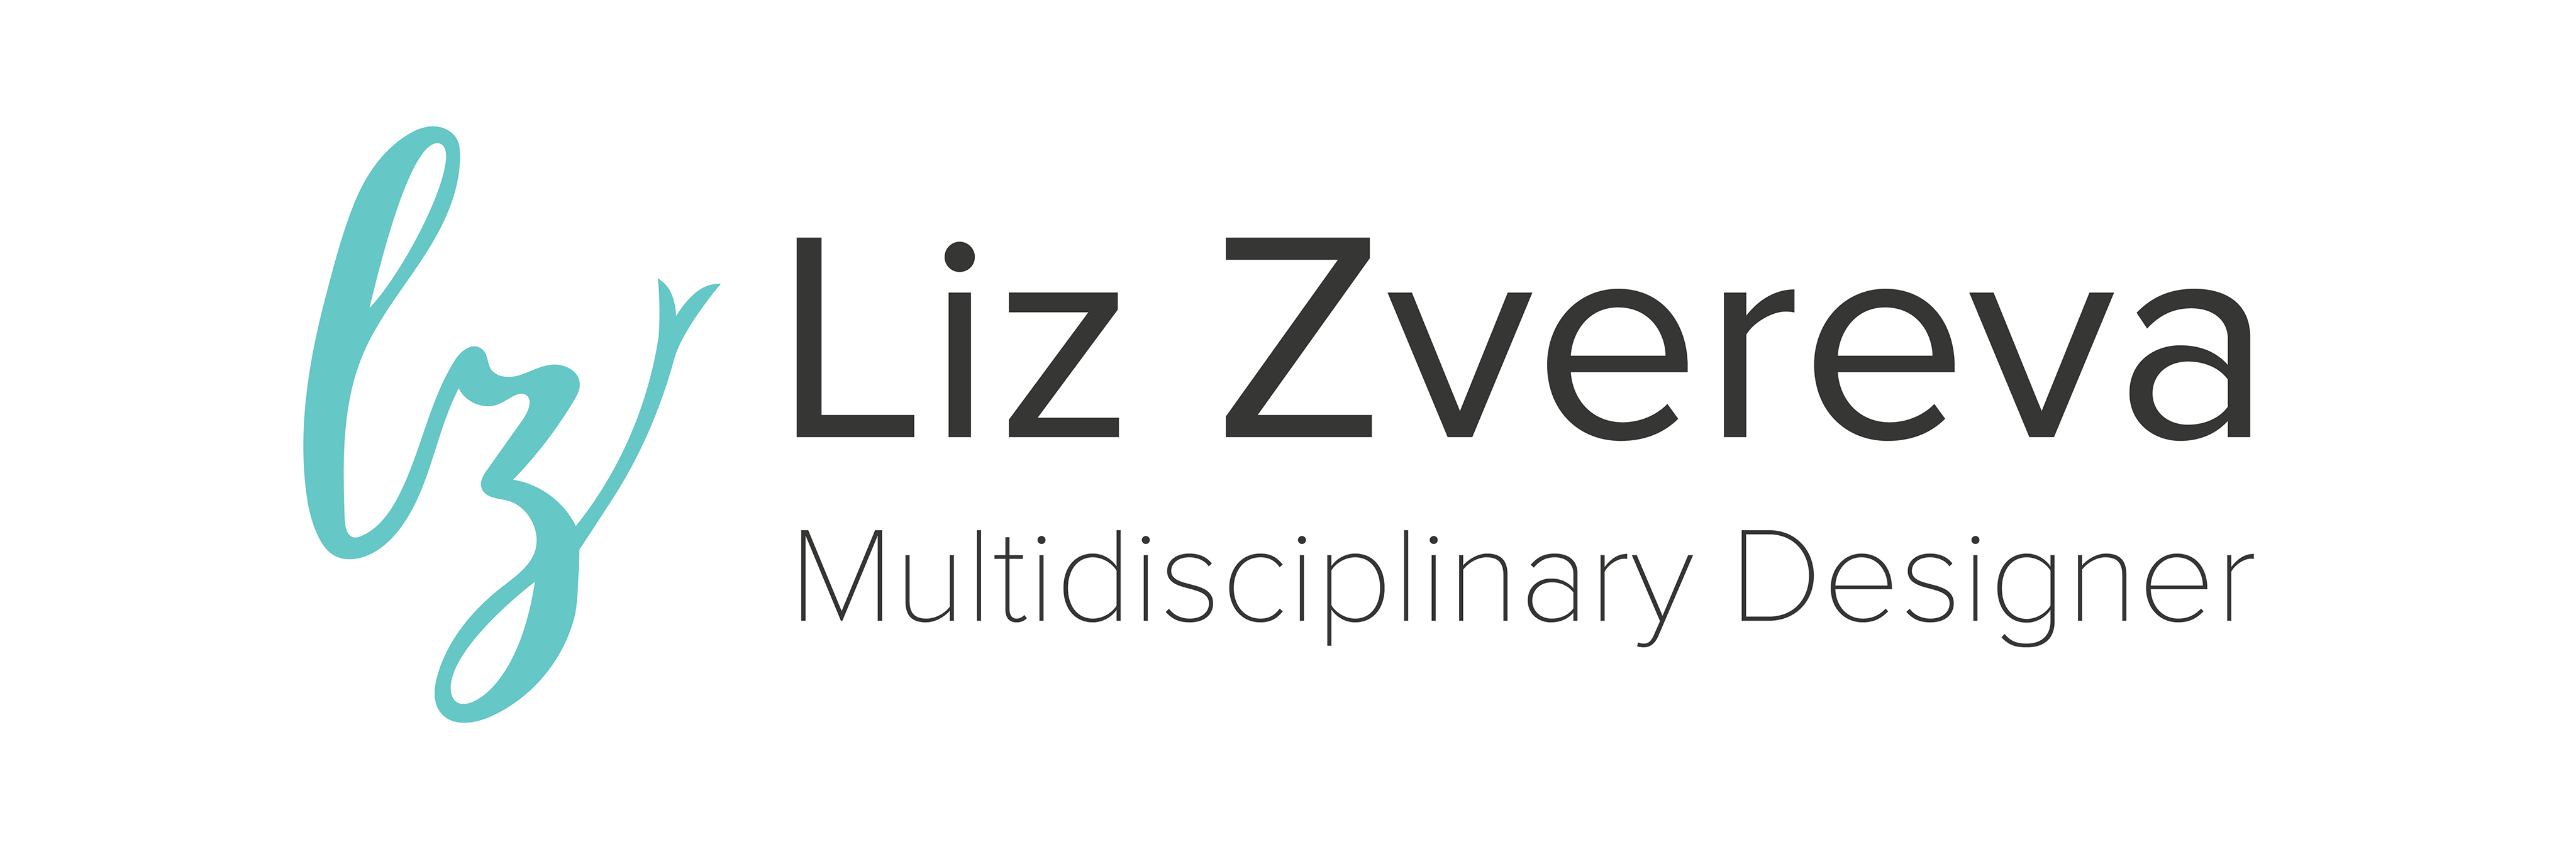 Liz Zvereva